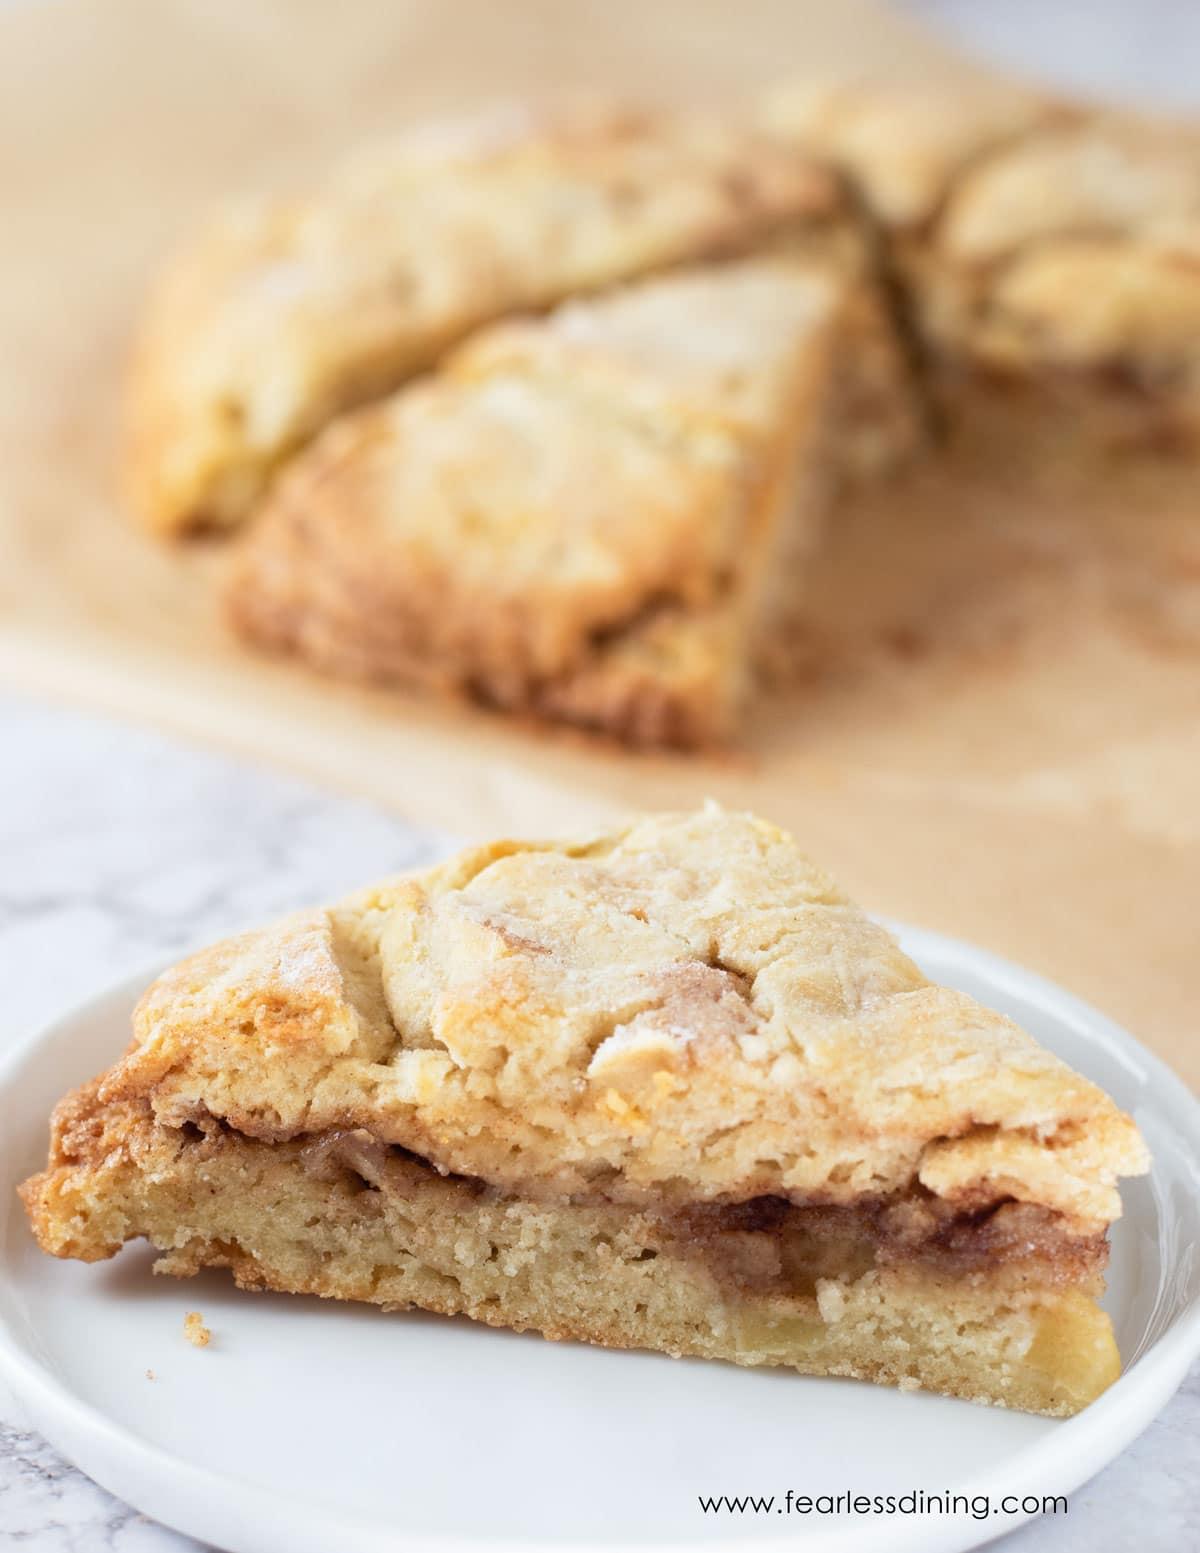 a gluten free cinnamon apple scone on a plate